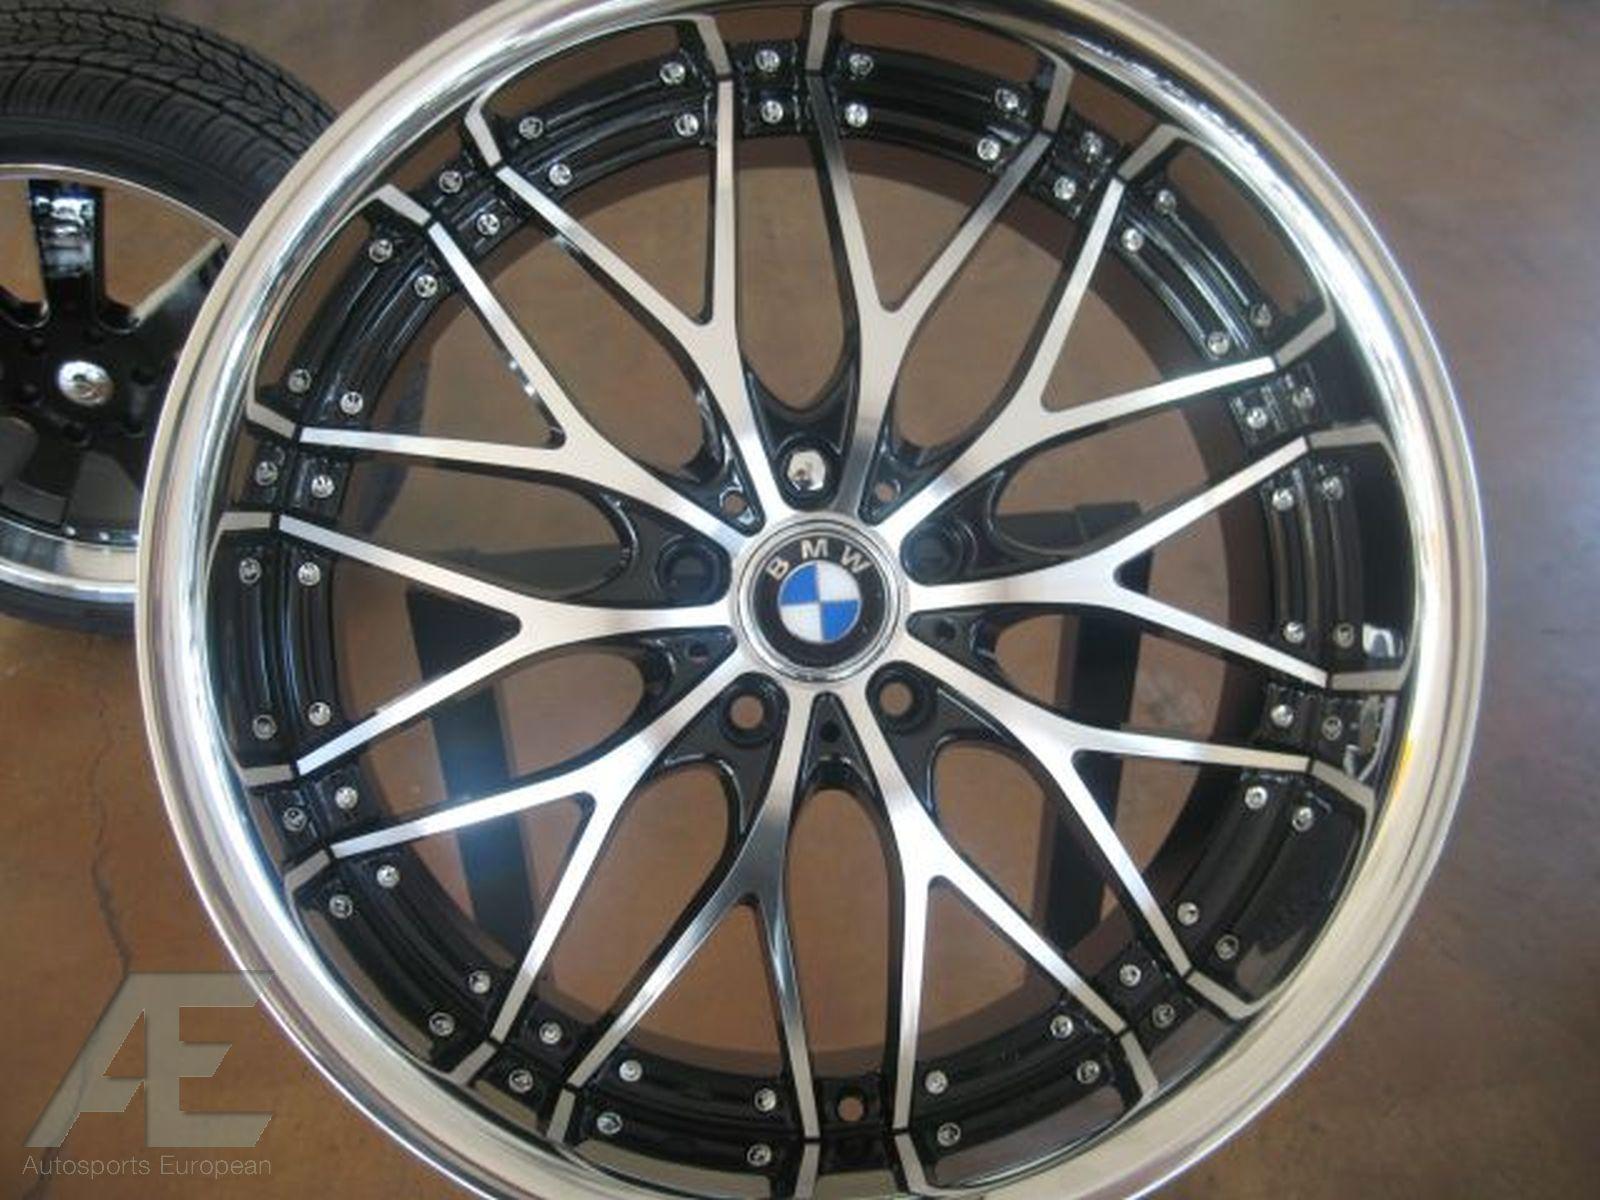 20 BMW Wheels Rims Tires 525i 530i 540i 650i 645i M5 M6